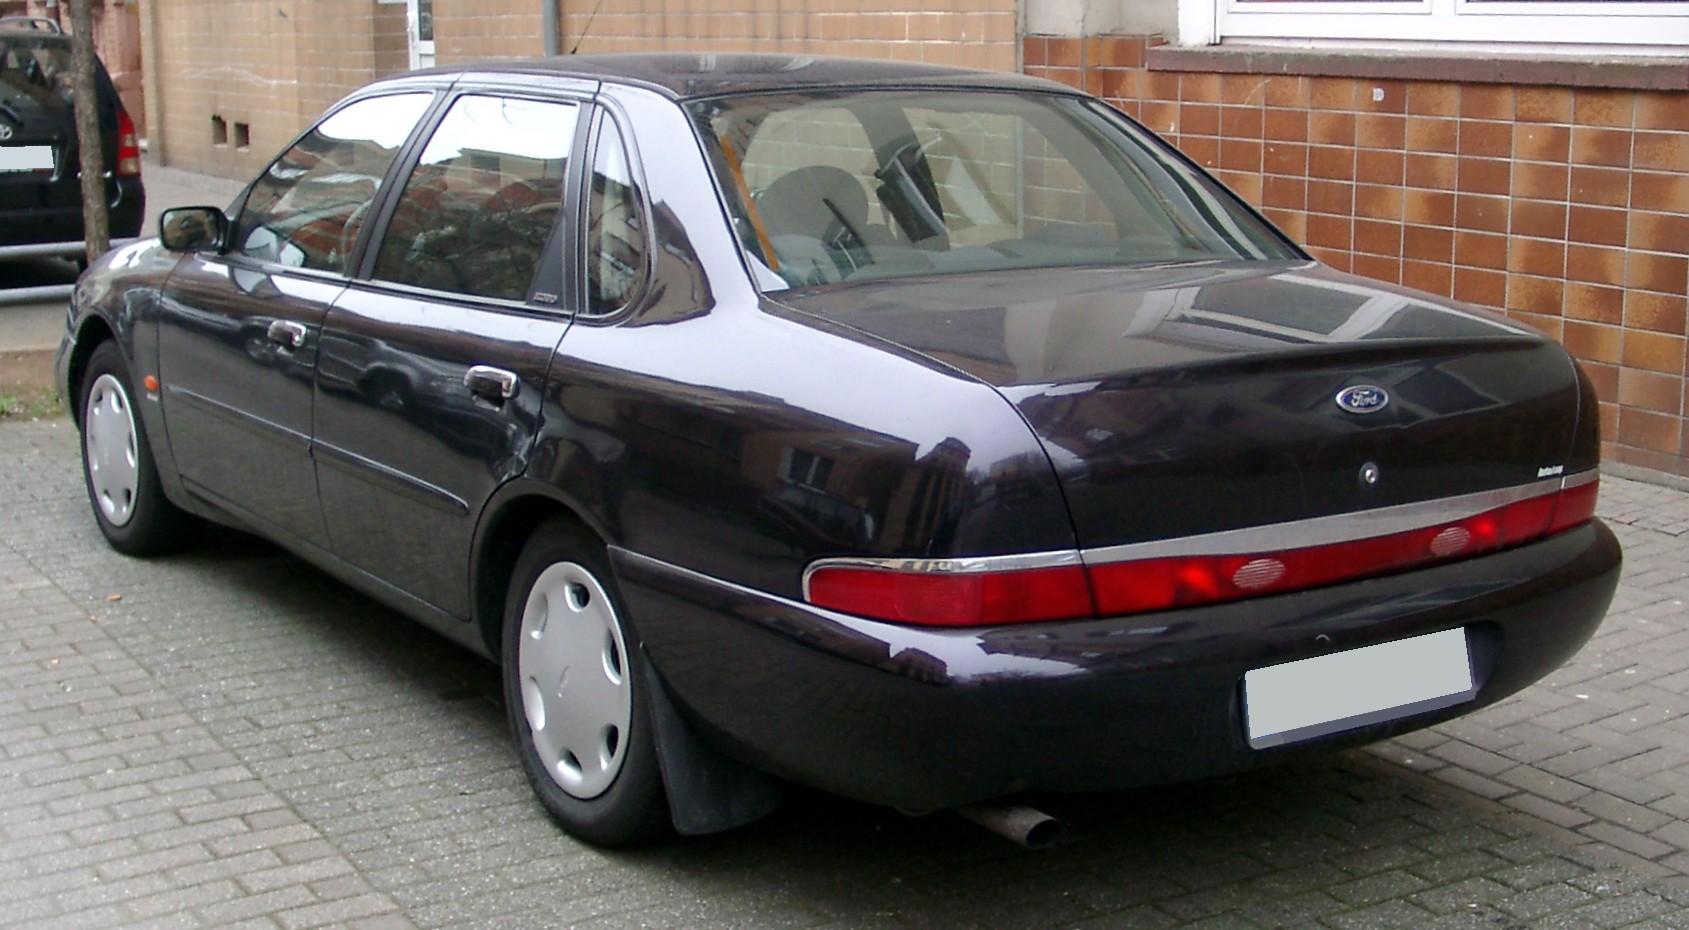 Ford_Scorpio_rear_20080214